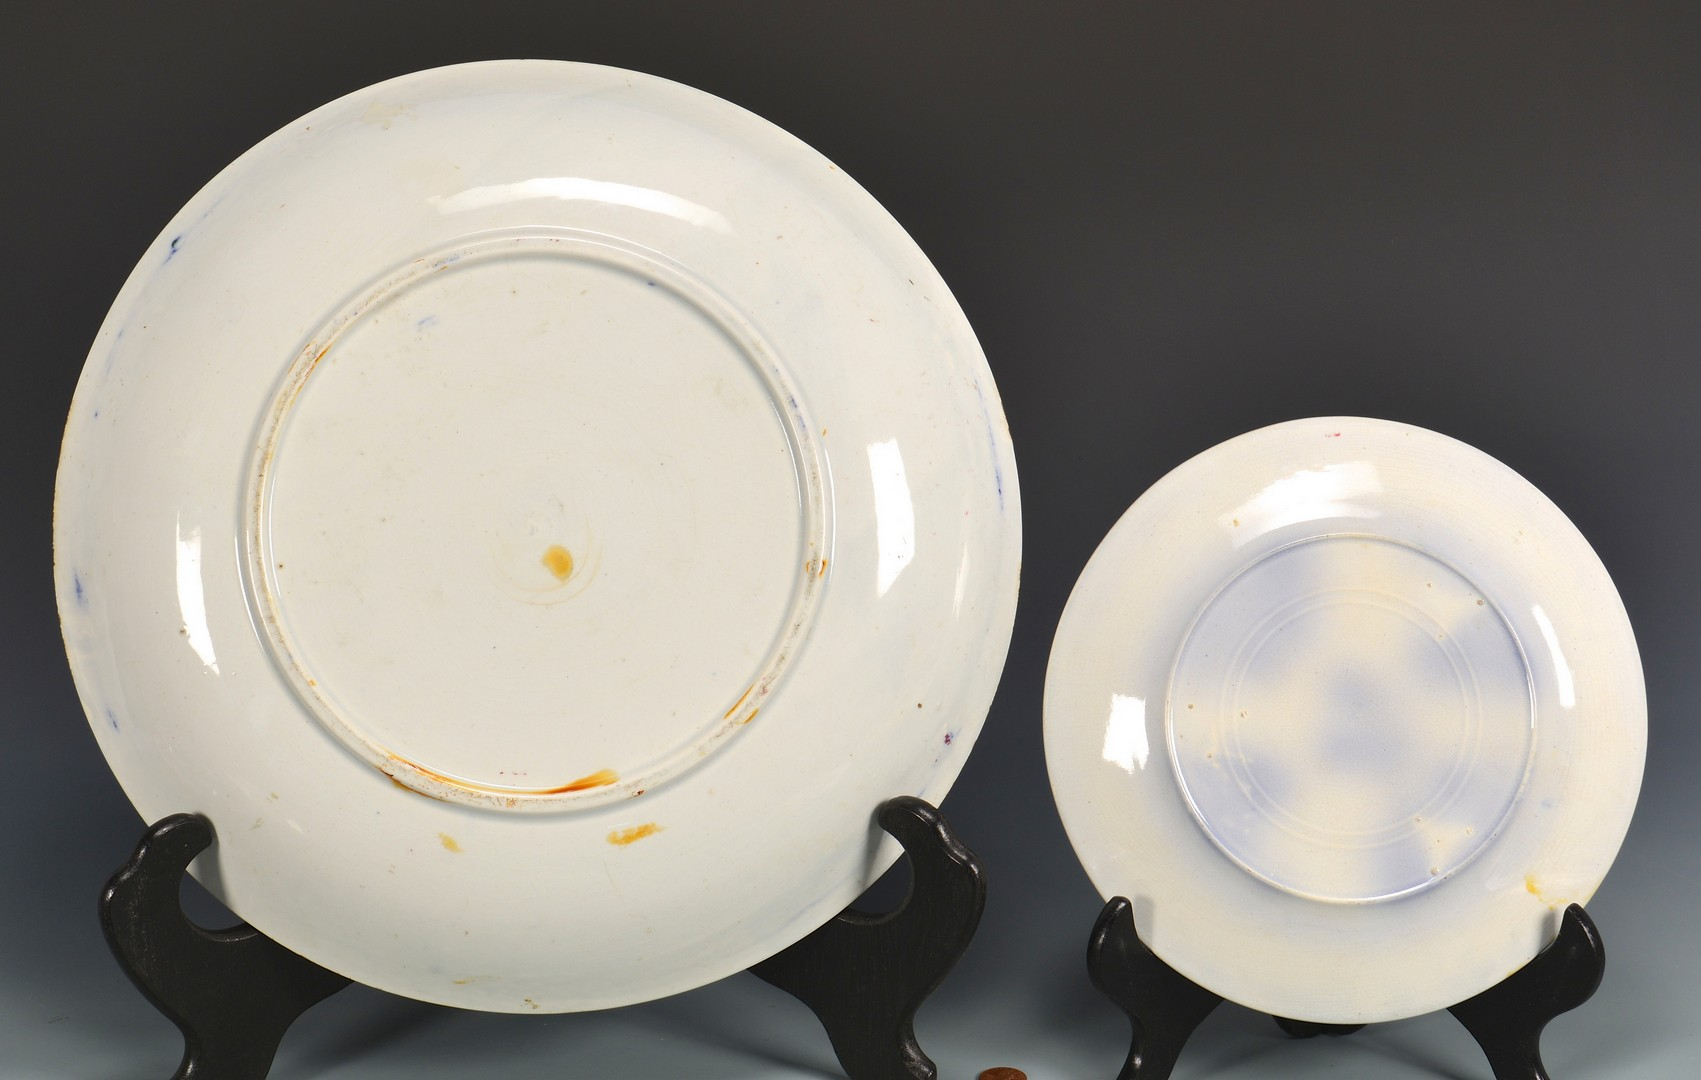 Lot 607: 6 Pcs. Stick Spatterware incl. Rabbitware